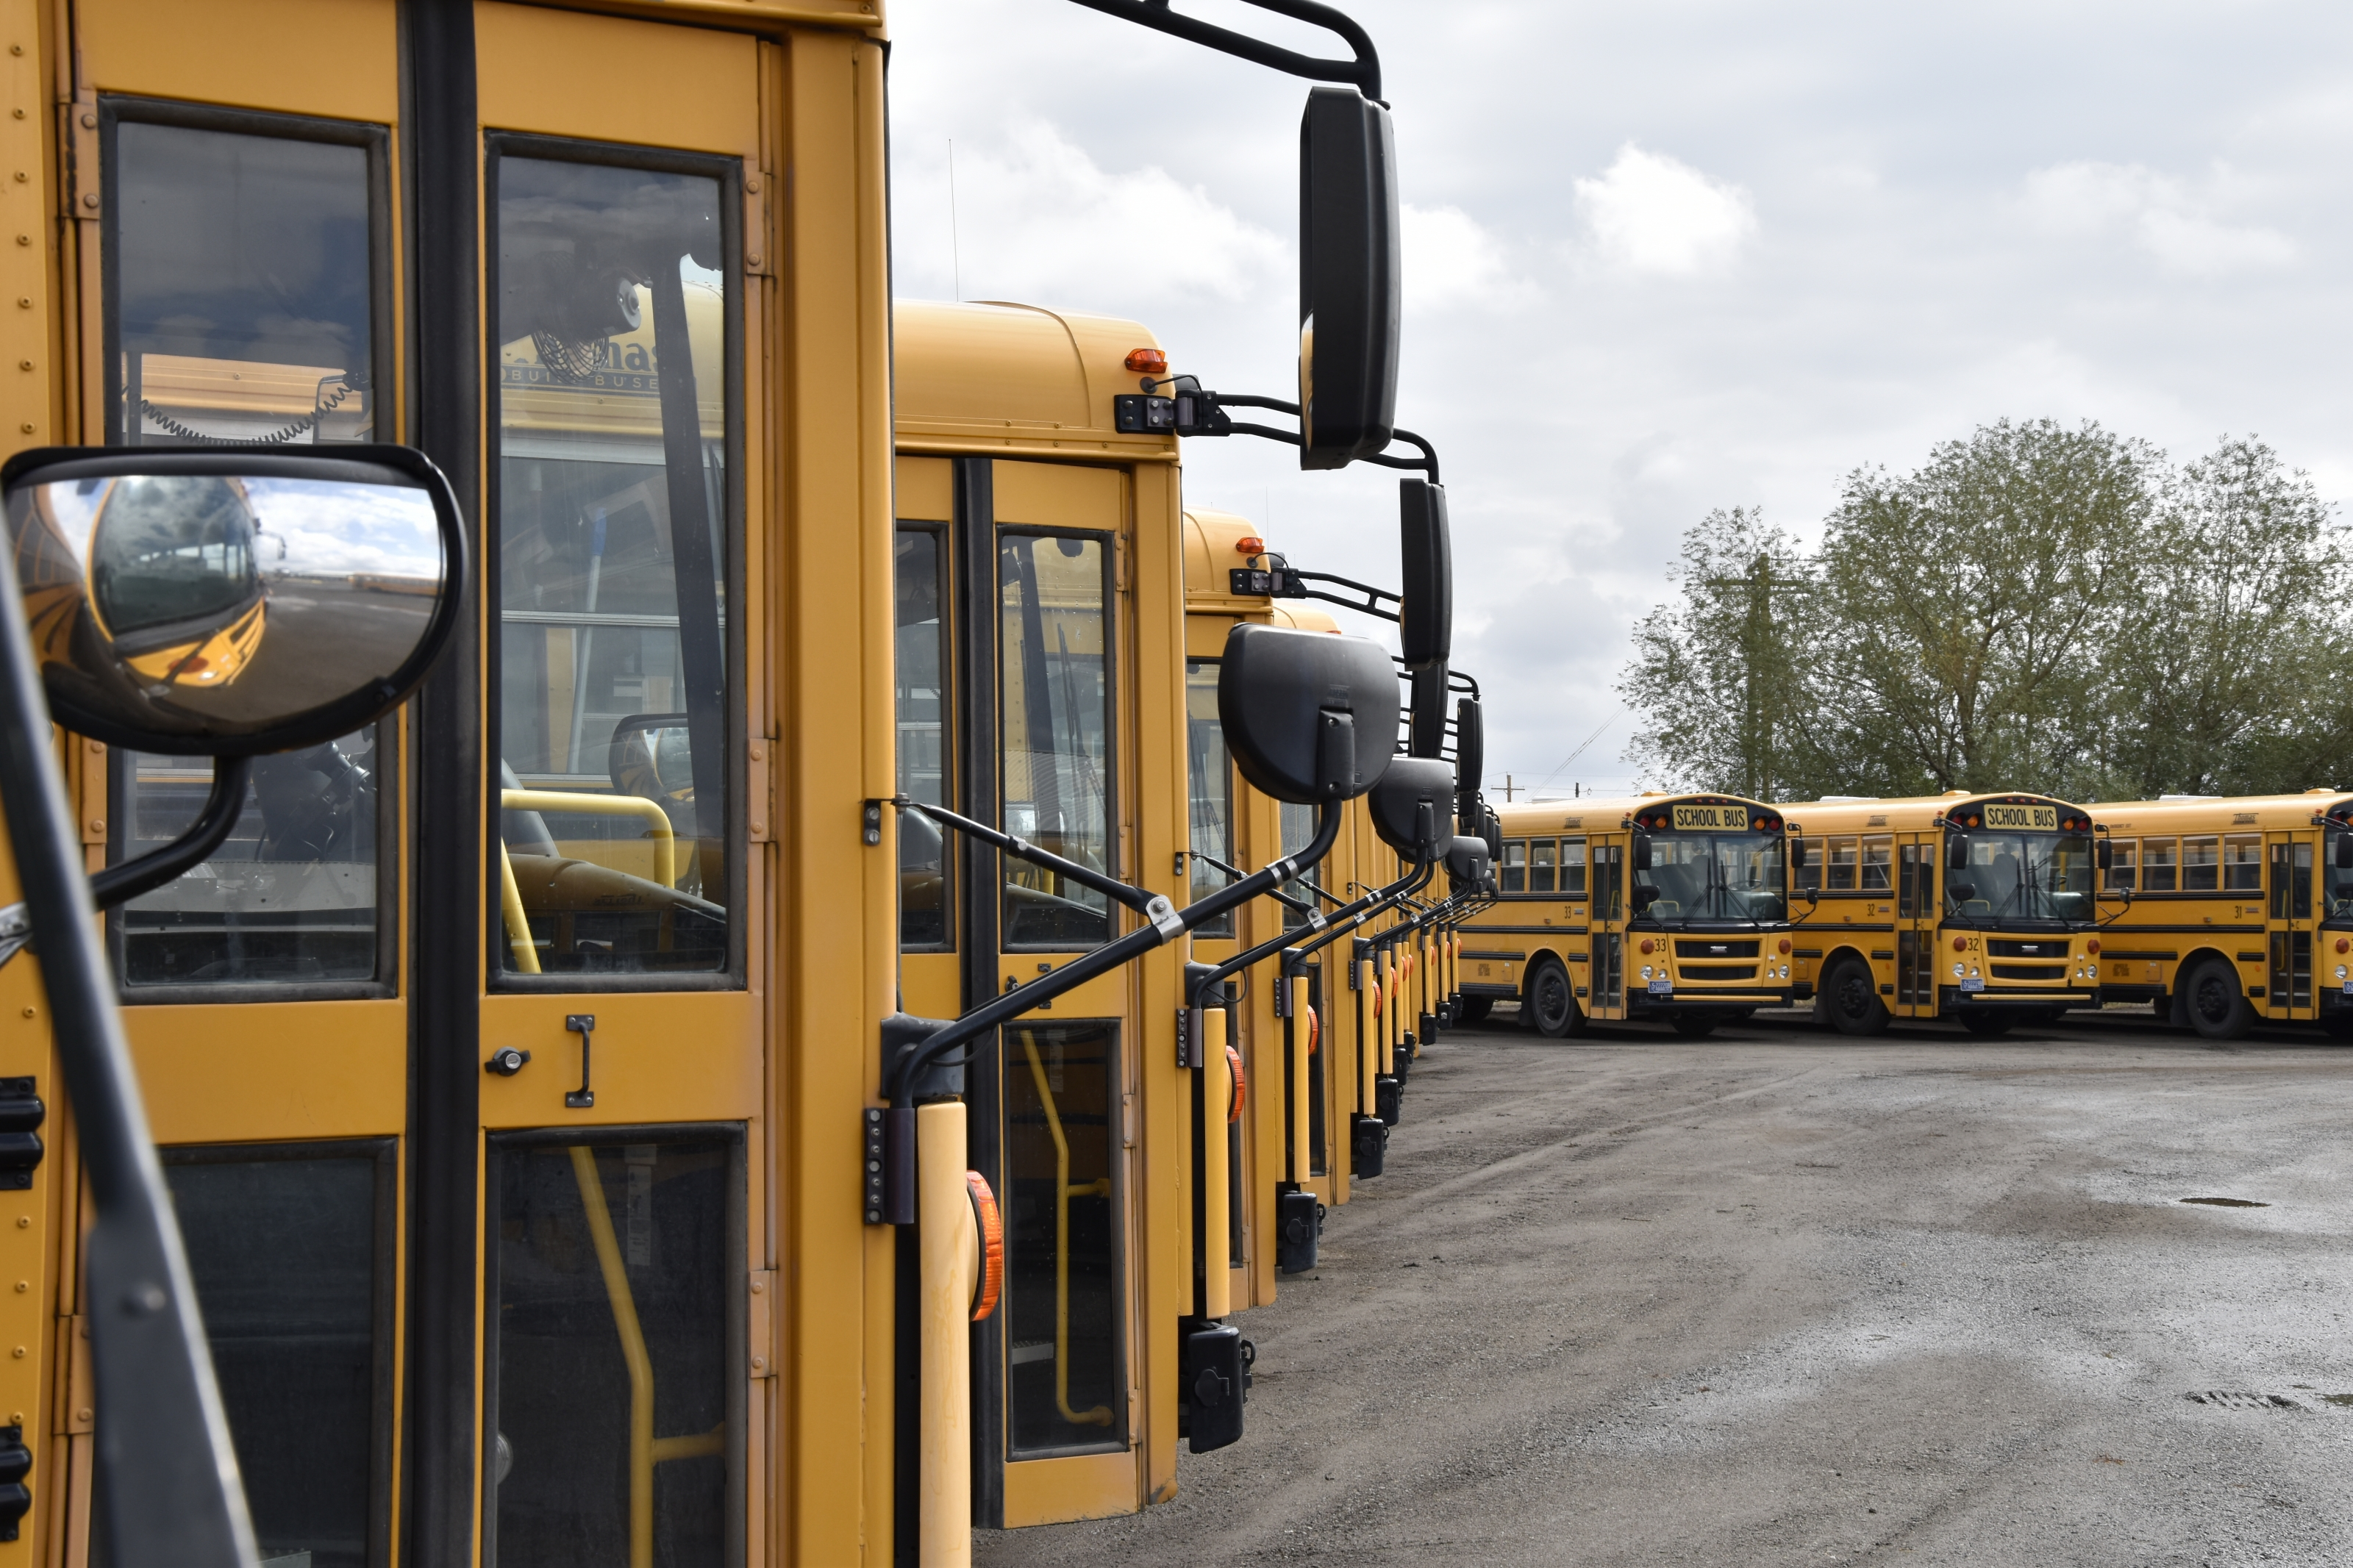 Loudoun Co. School Board to codify free speech after courts overturn teacher suspension